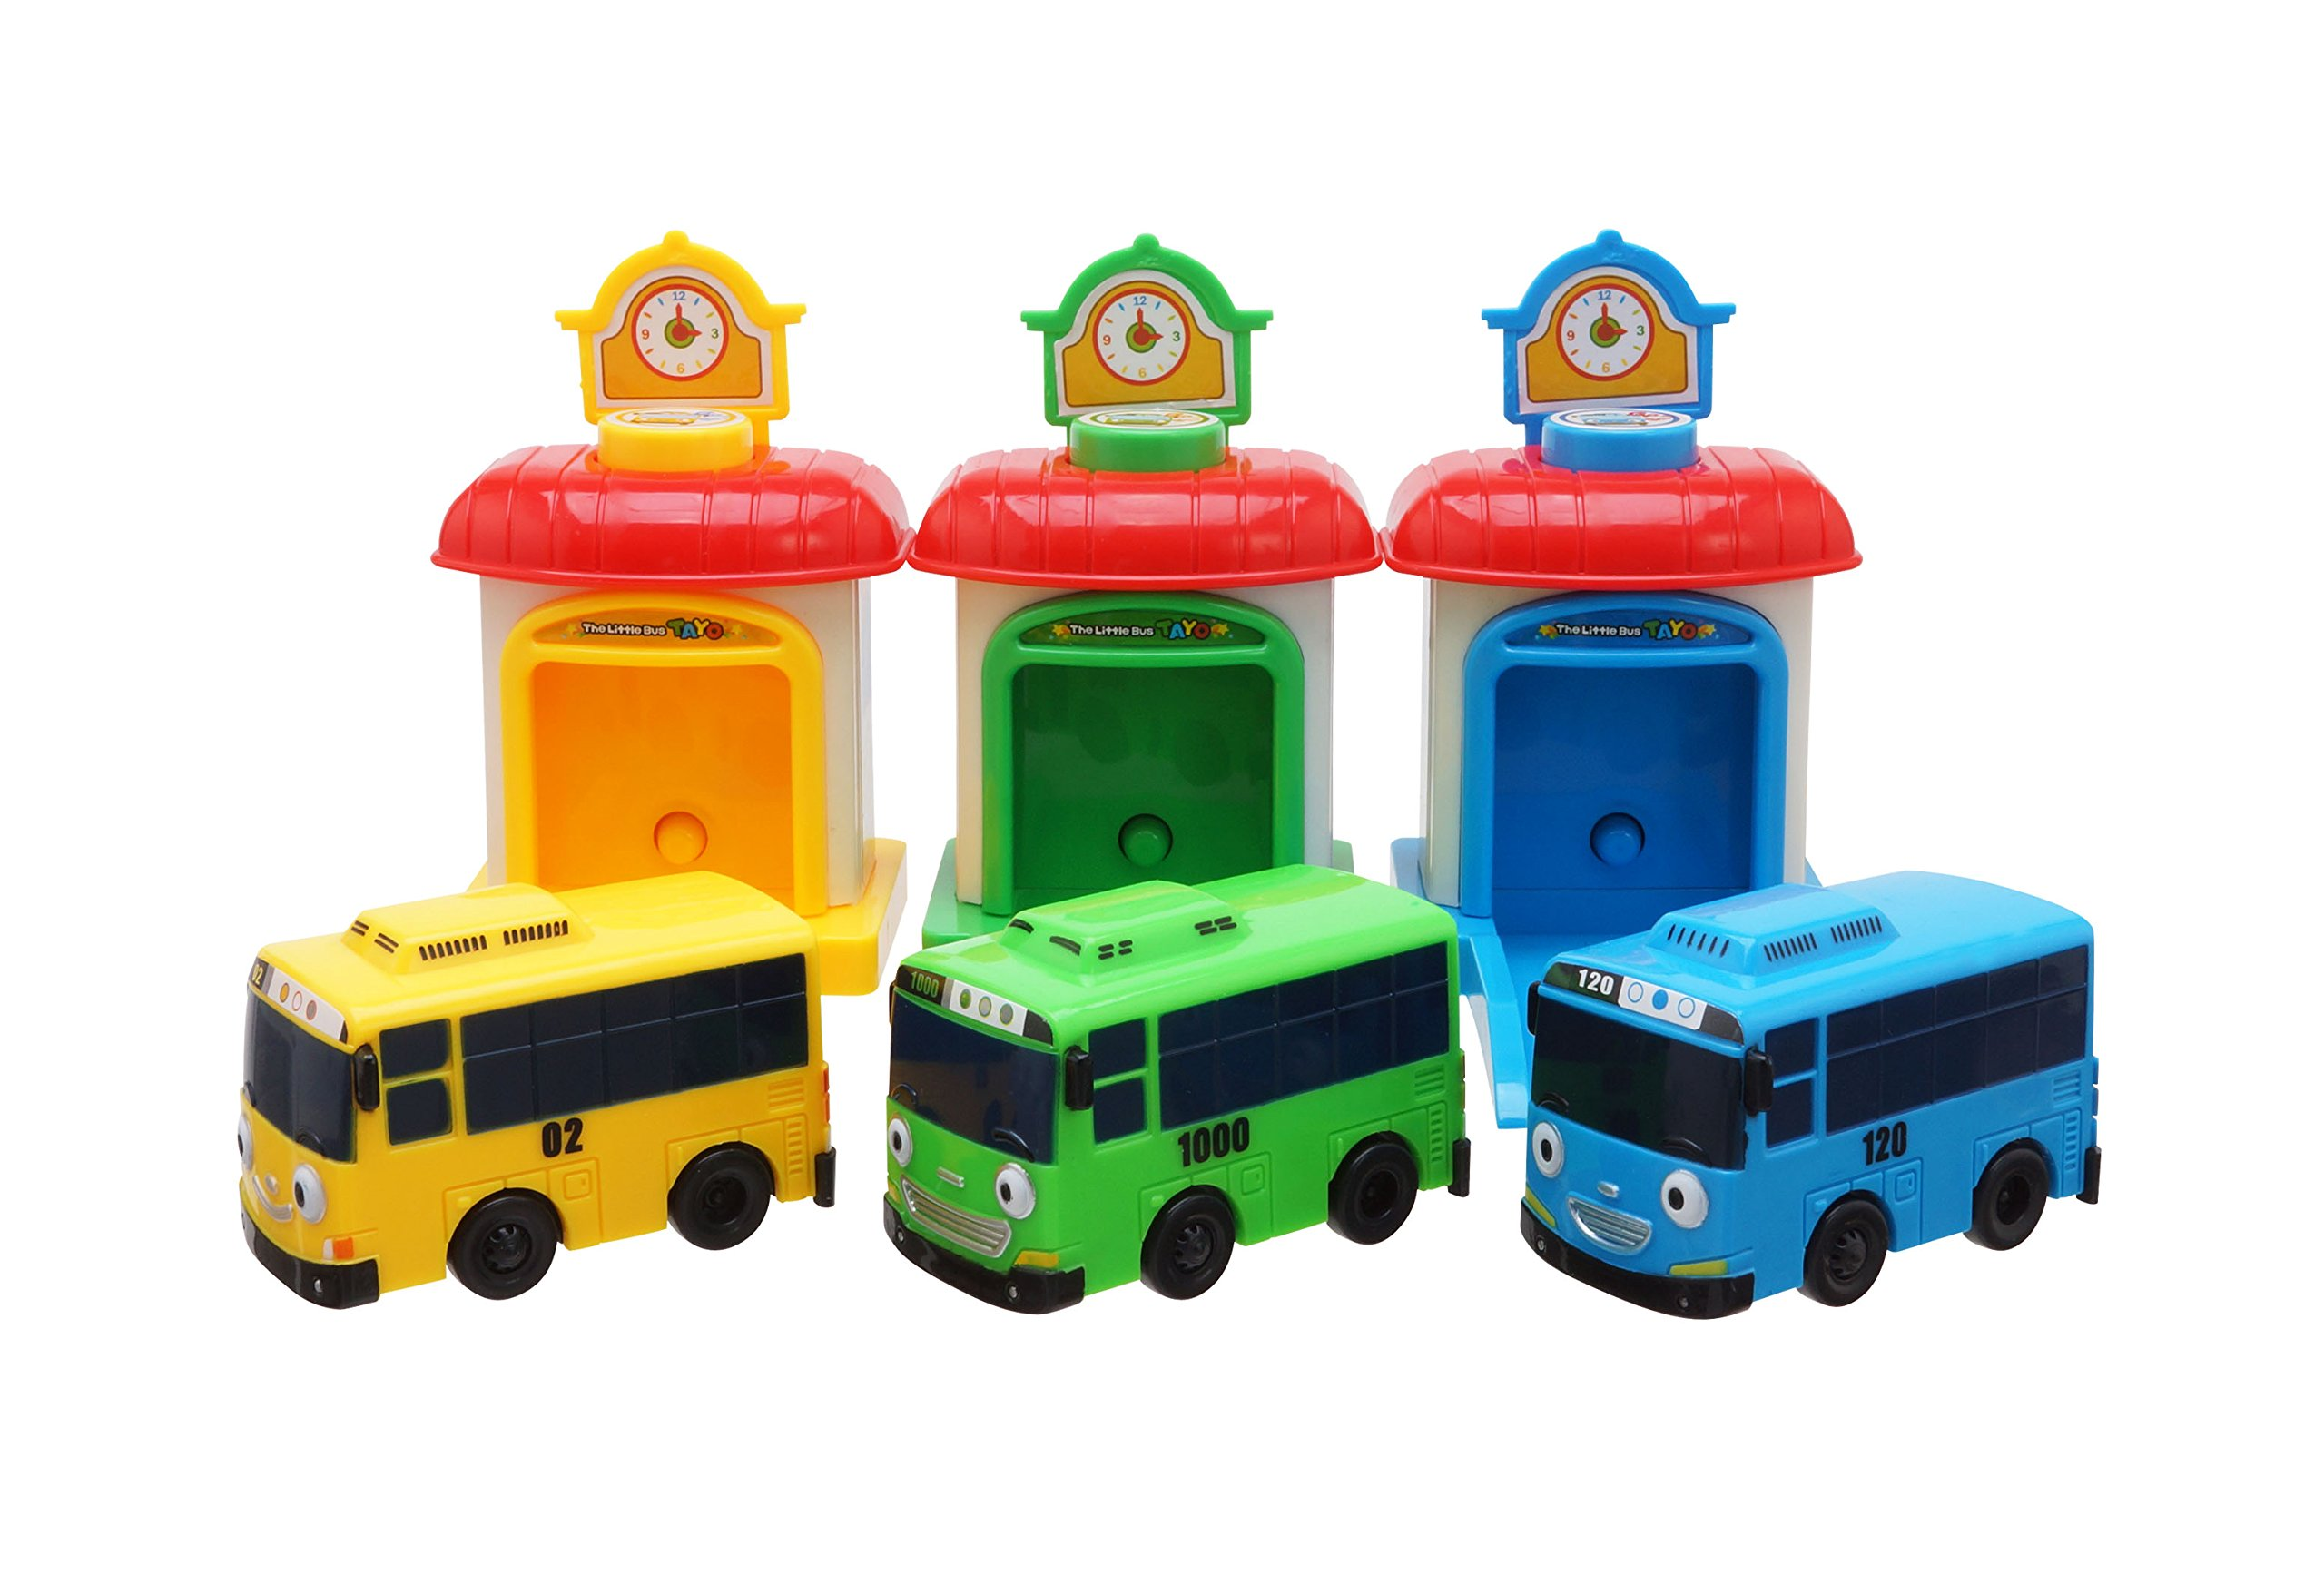 Tayo the Little Bus, Shooting Car Set, Pull-back Motor & Station Set, TAYO, ROGI, LANI